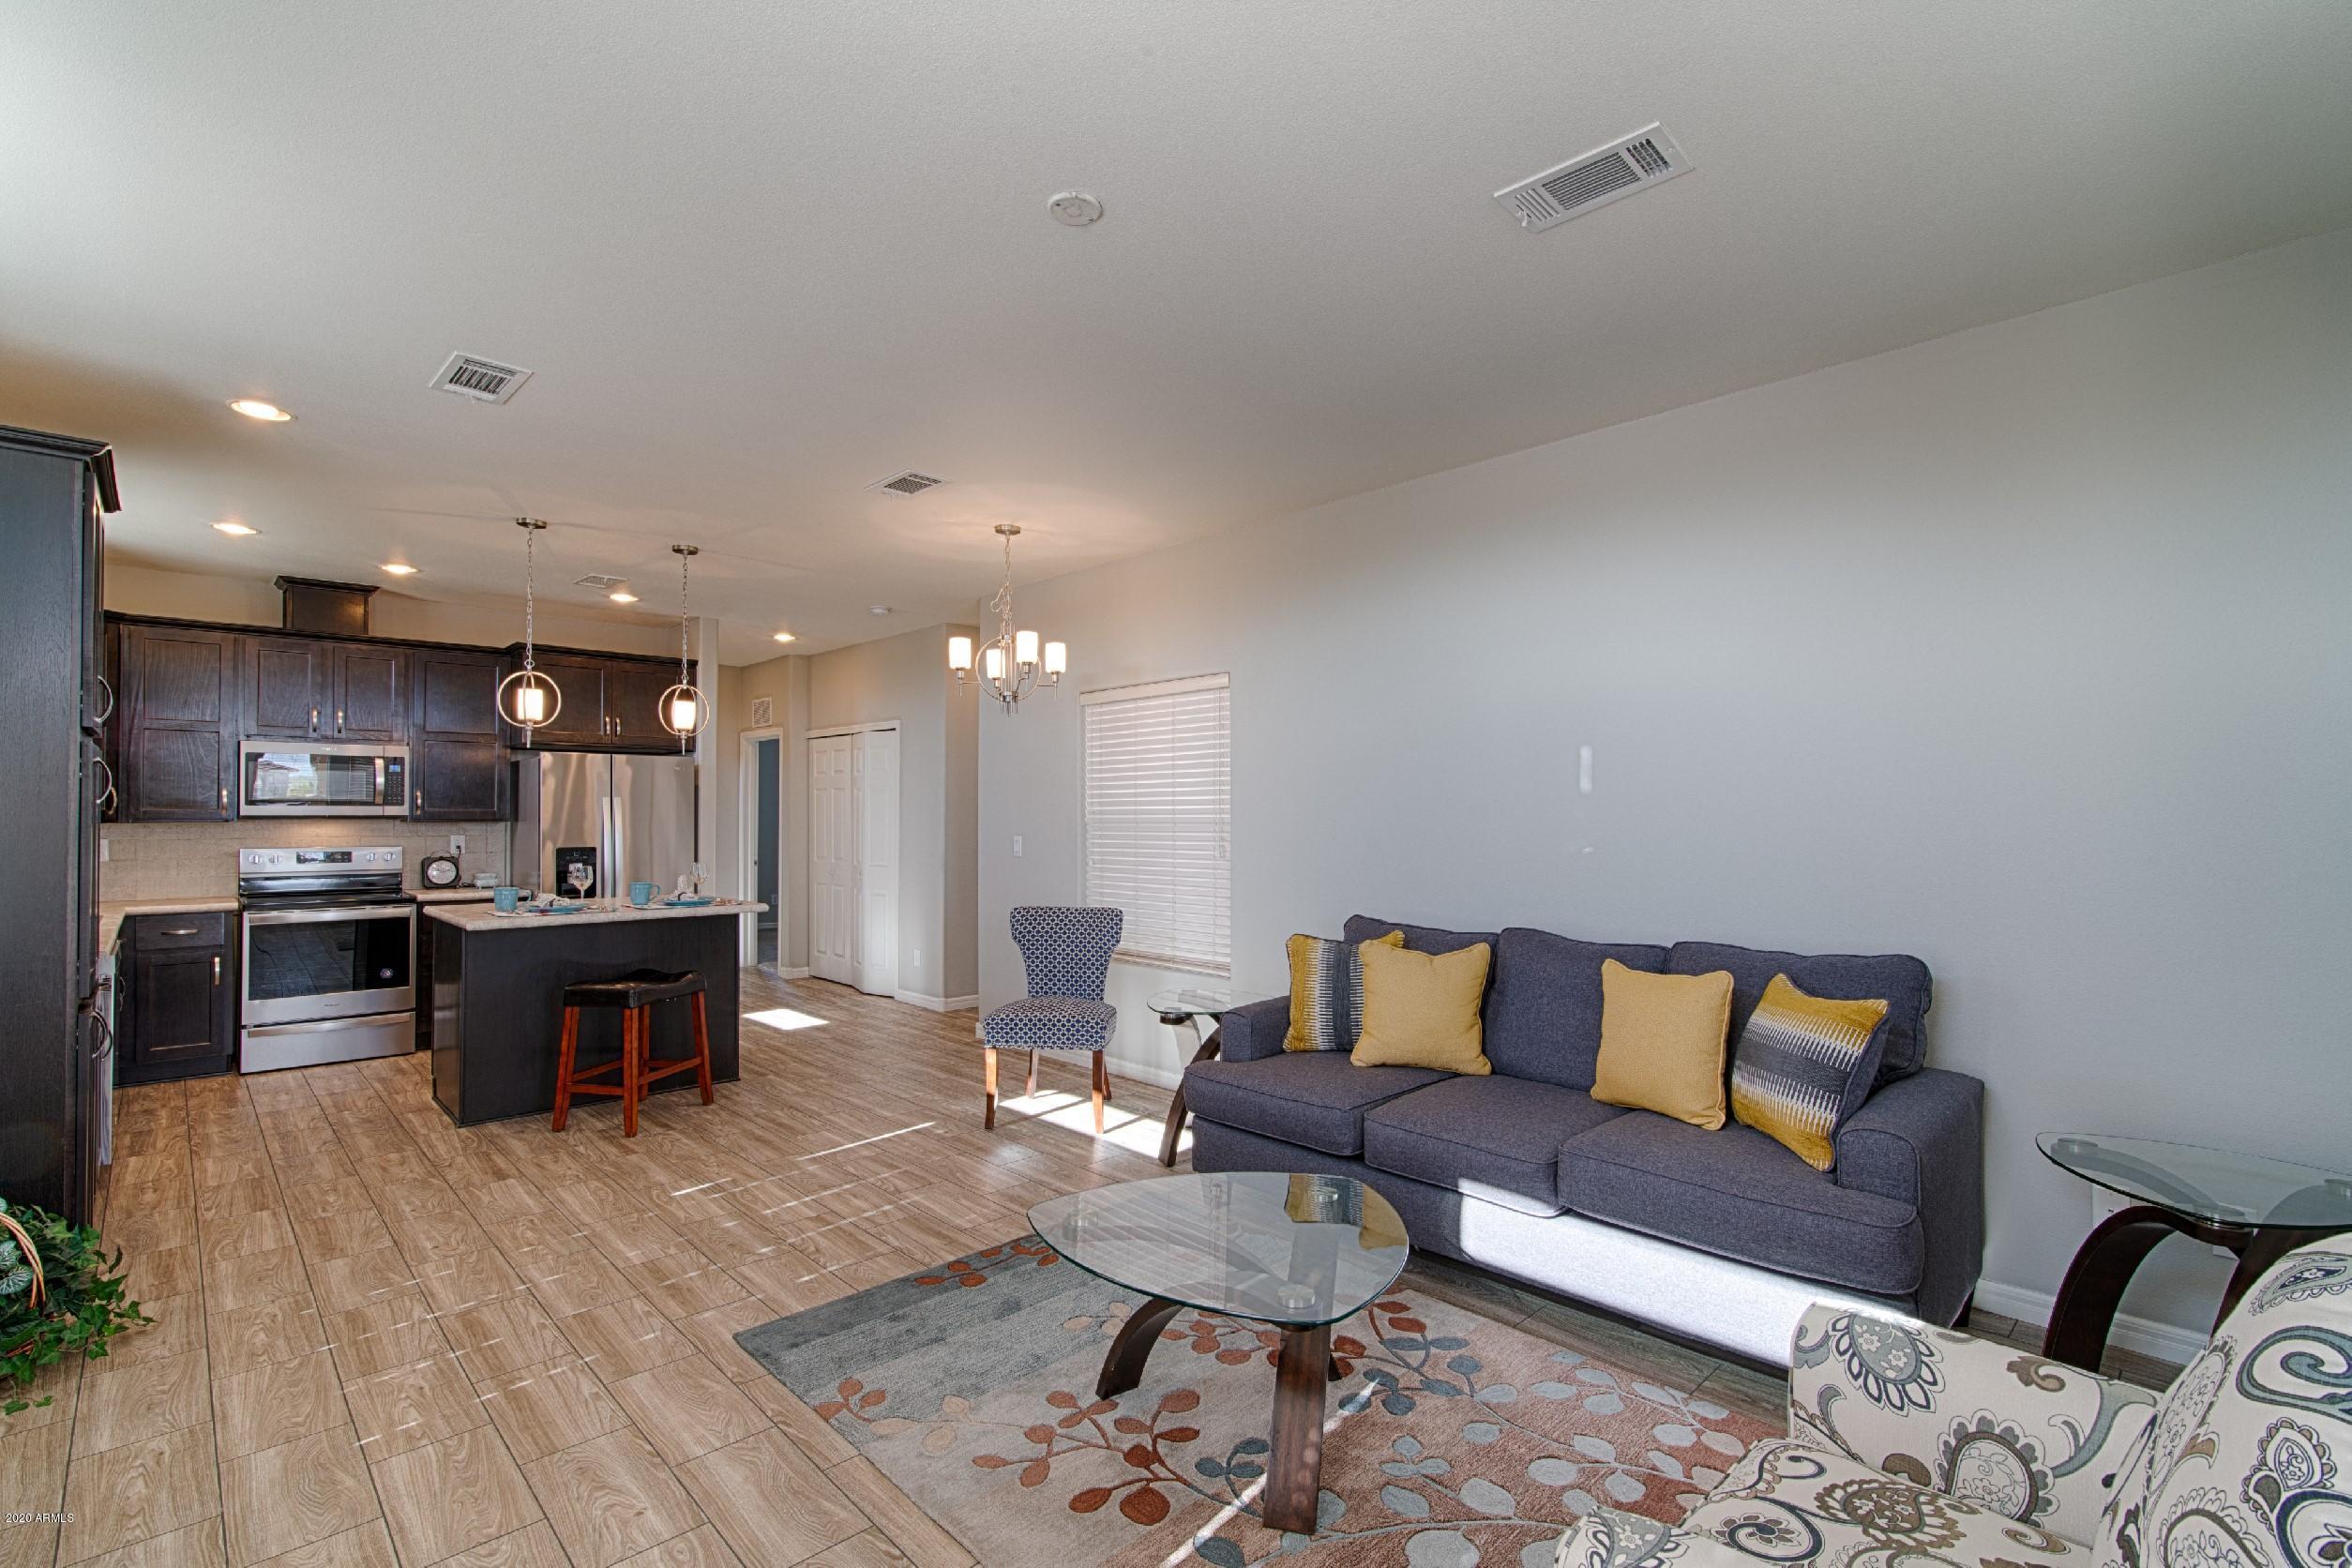 MLS 6145832 7373 E US HIGHWAY 60 -- Unit 316, Gold Canyon, AZ 85118 Gold Canyon AZ Affordable